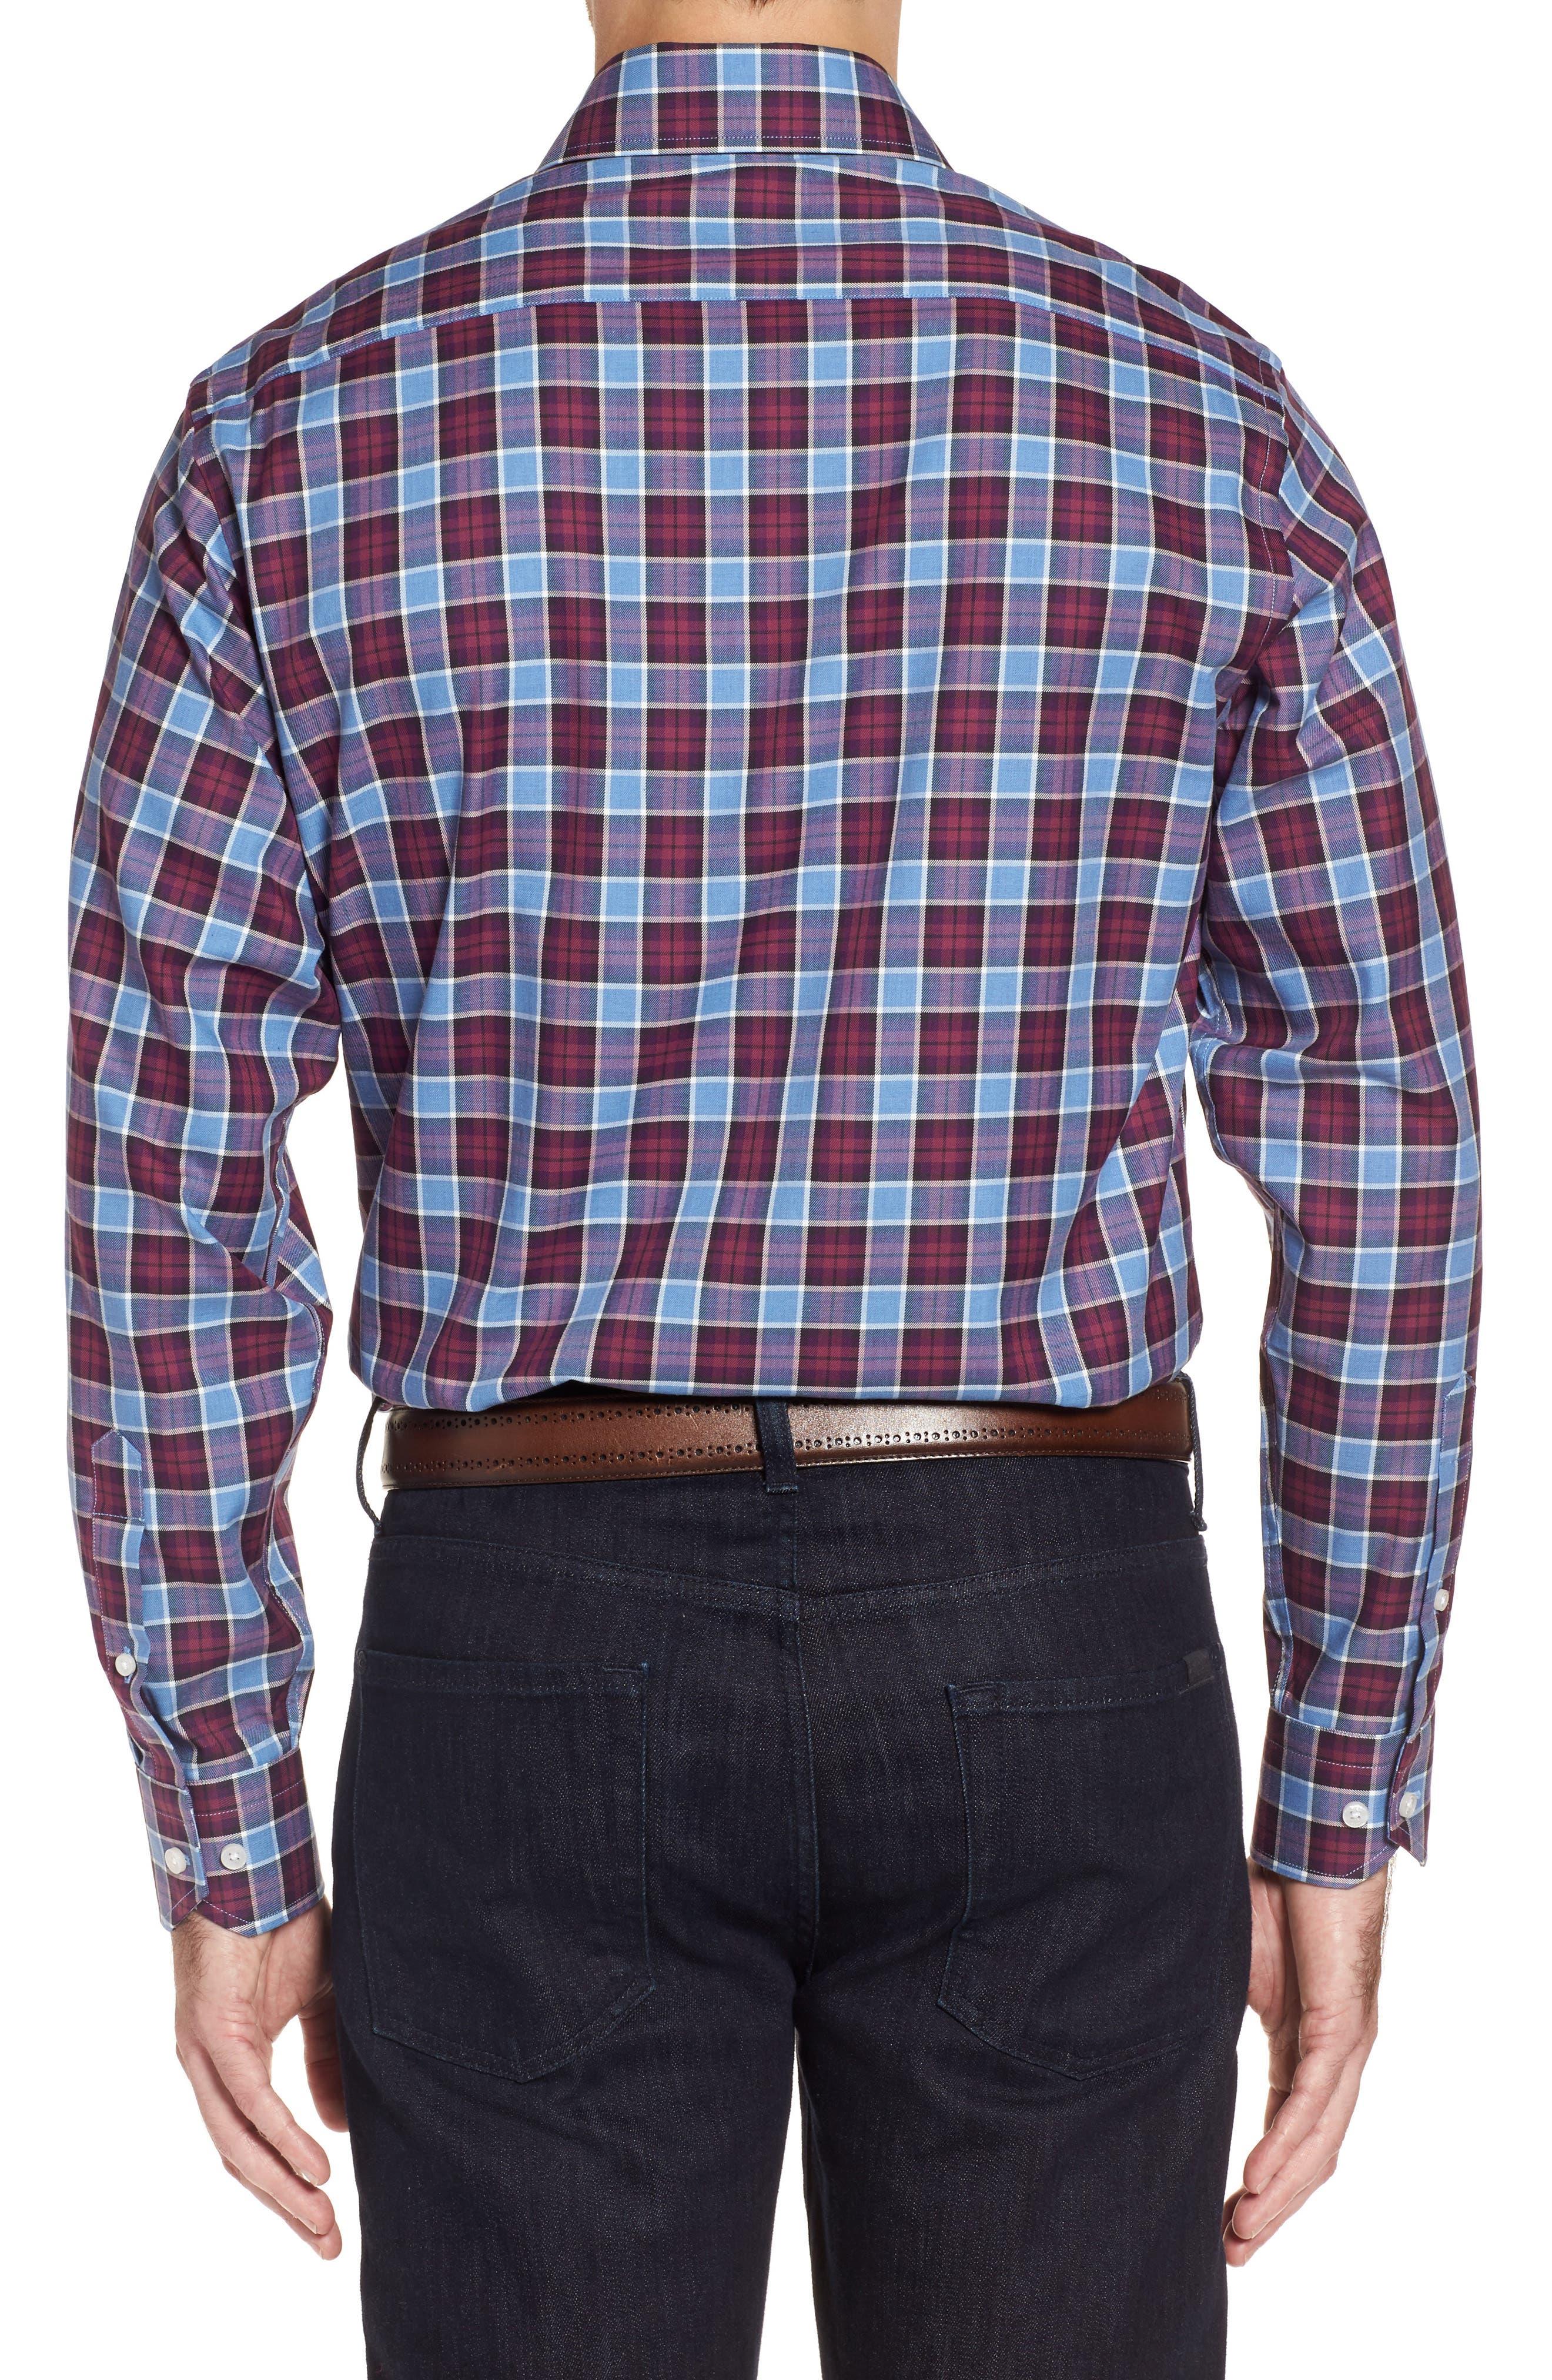 Alternate Image 2  - TailorByrd Campti Regular Fit Plaid Sport Shirt